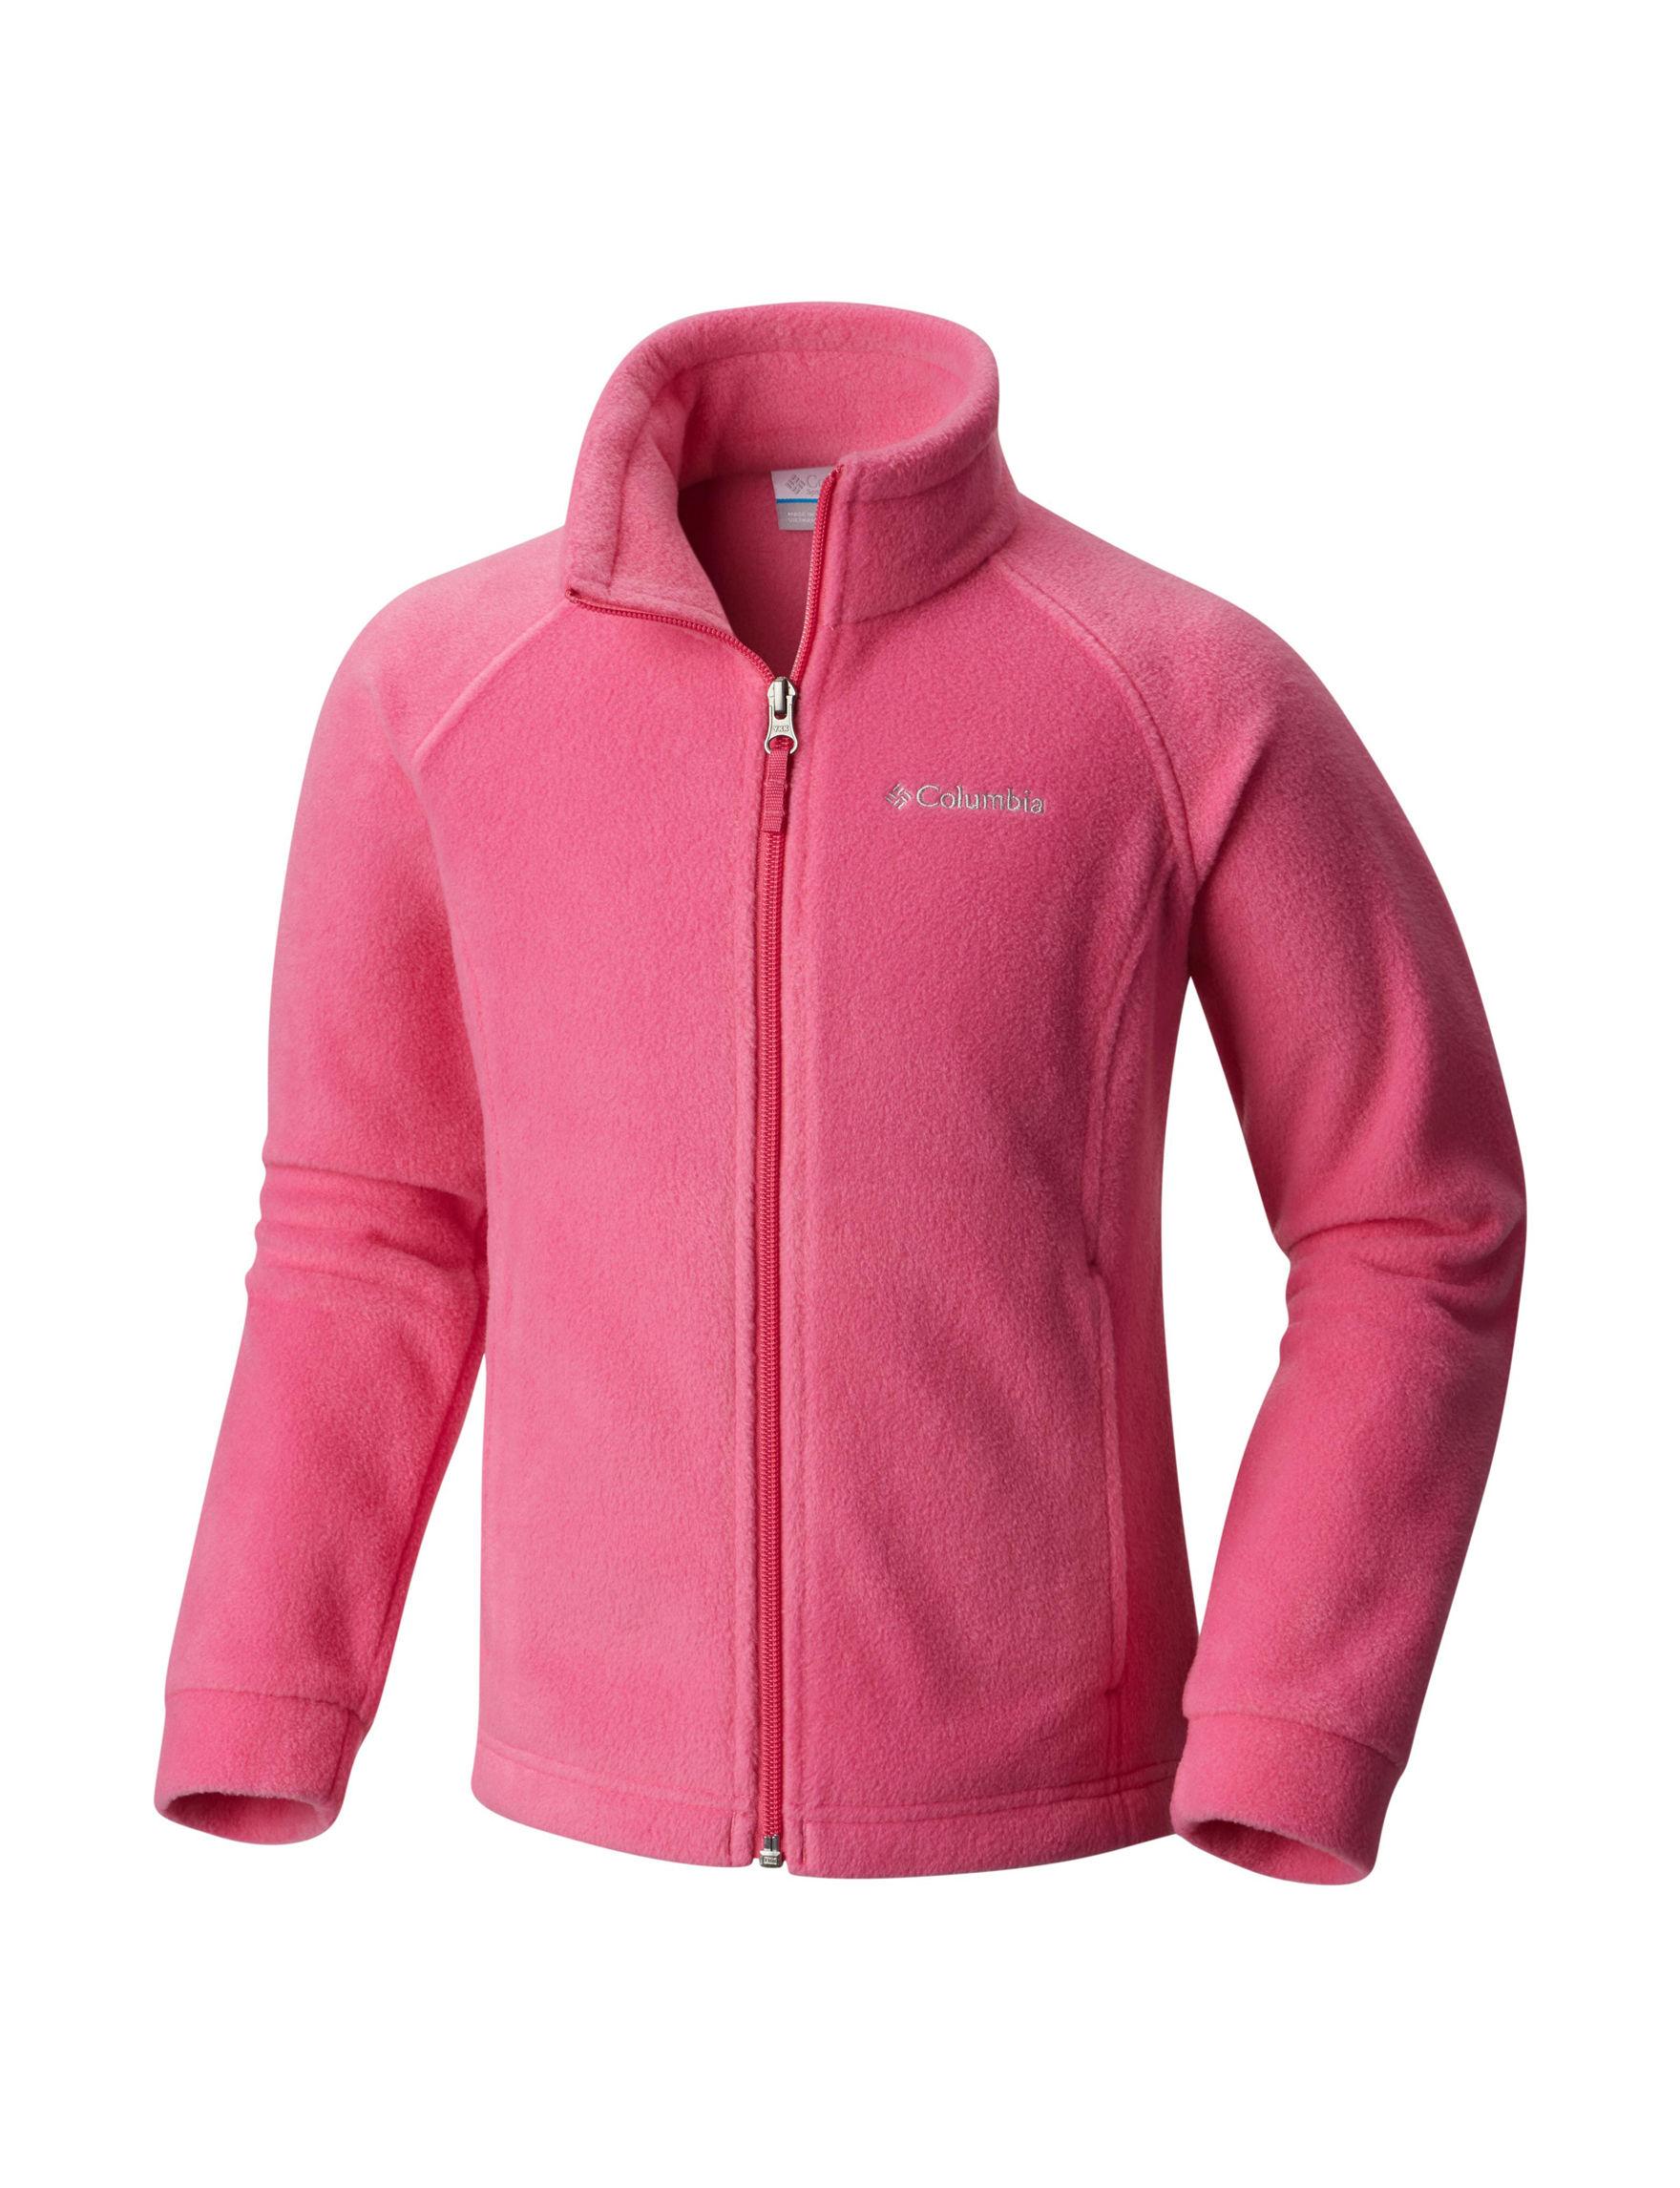 Columbia Pink Fleece & Soft Shell Jackets